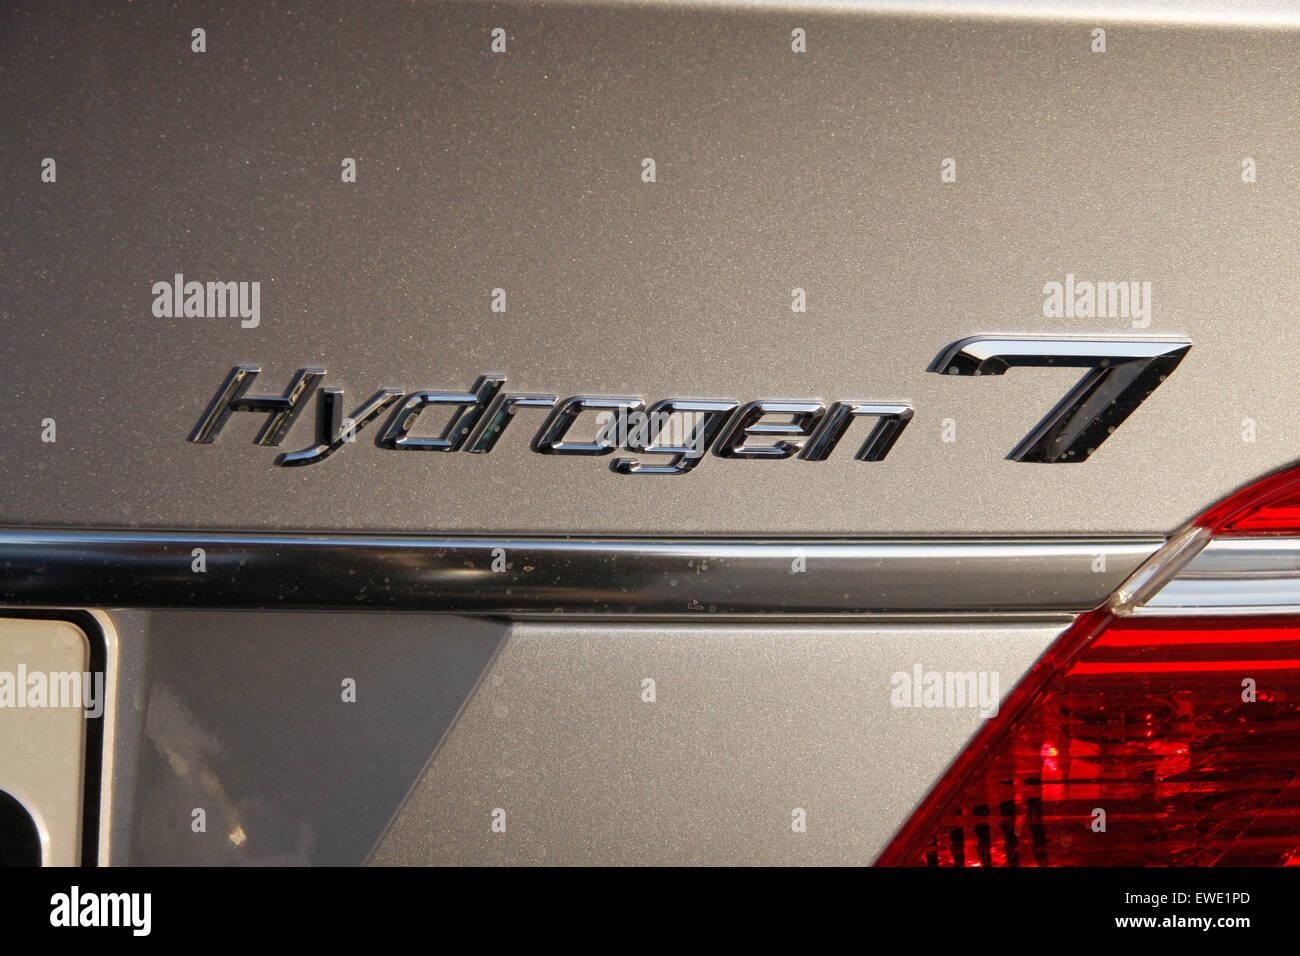 JUNE 2008 - BERLIN: 'Hydrogen 7' a luxury sedan of the German car manufacturer BMW - Bayerische Motorenwerke, - Stock Image